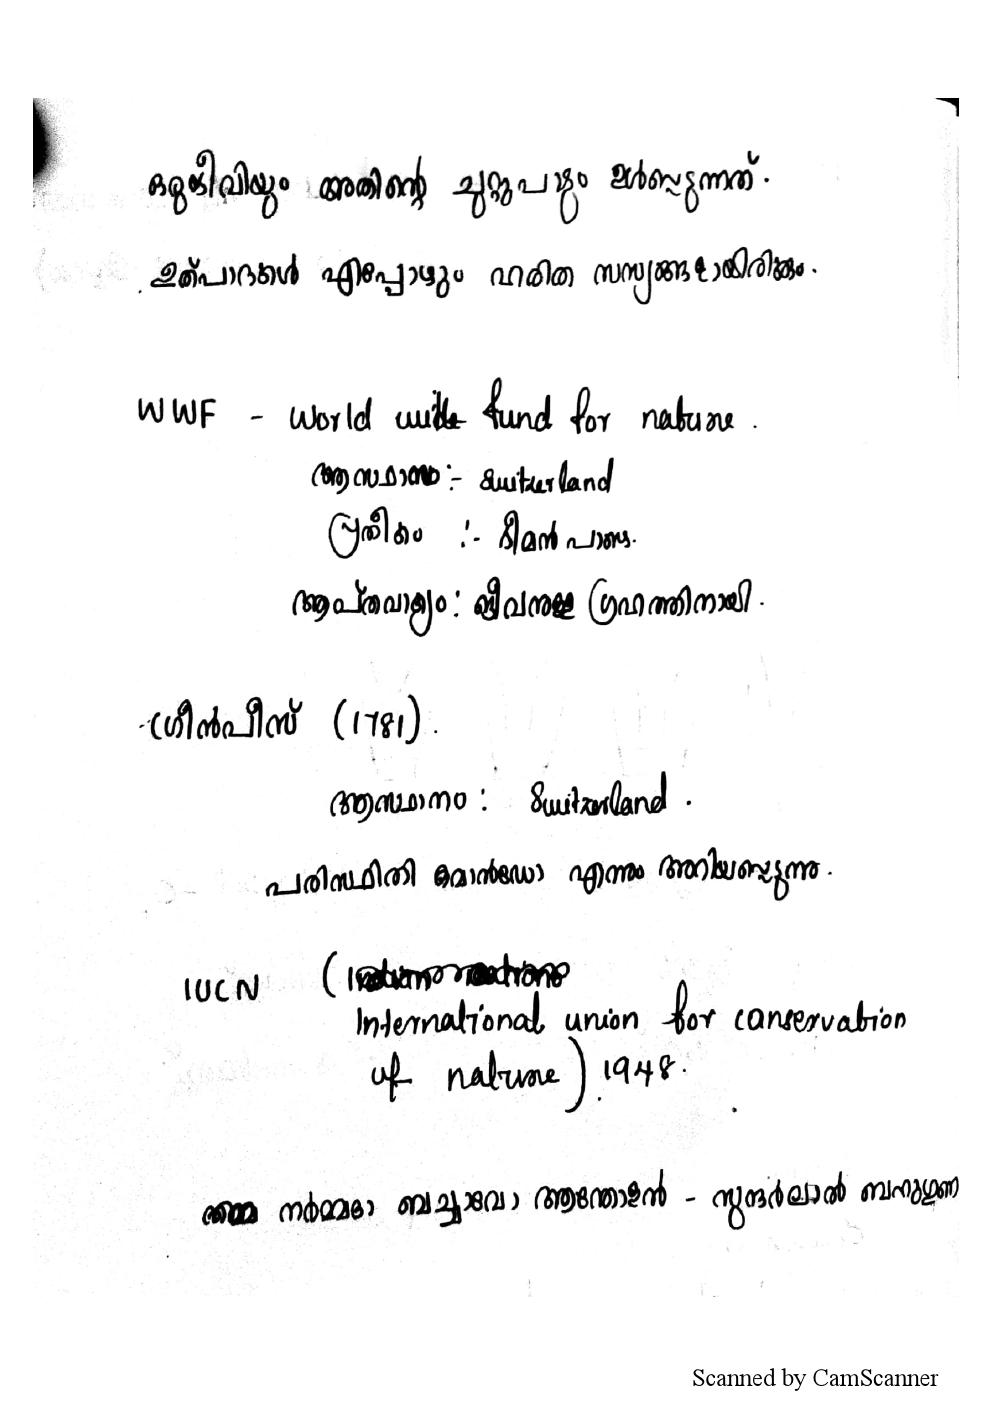 http://masterstudy.net/pdf/ktet_notes0037.png